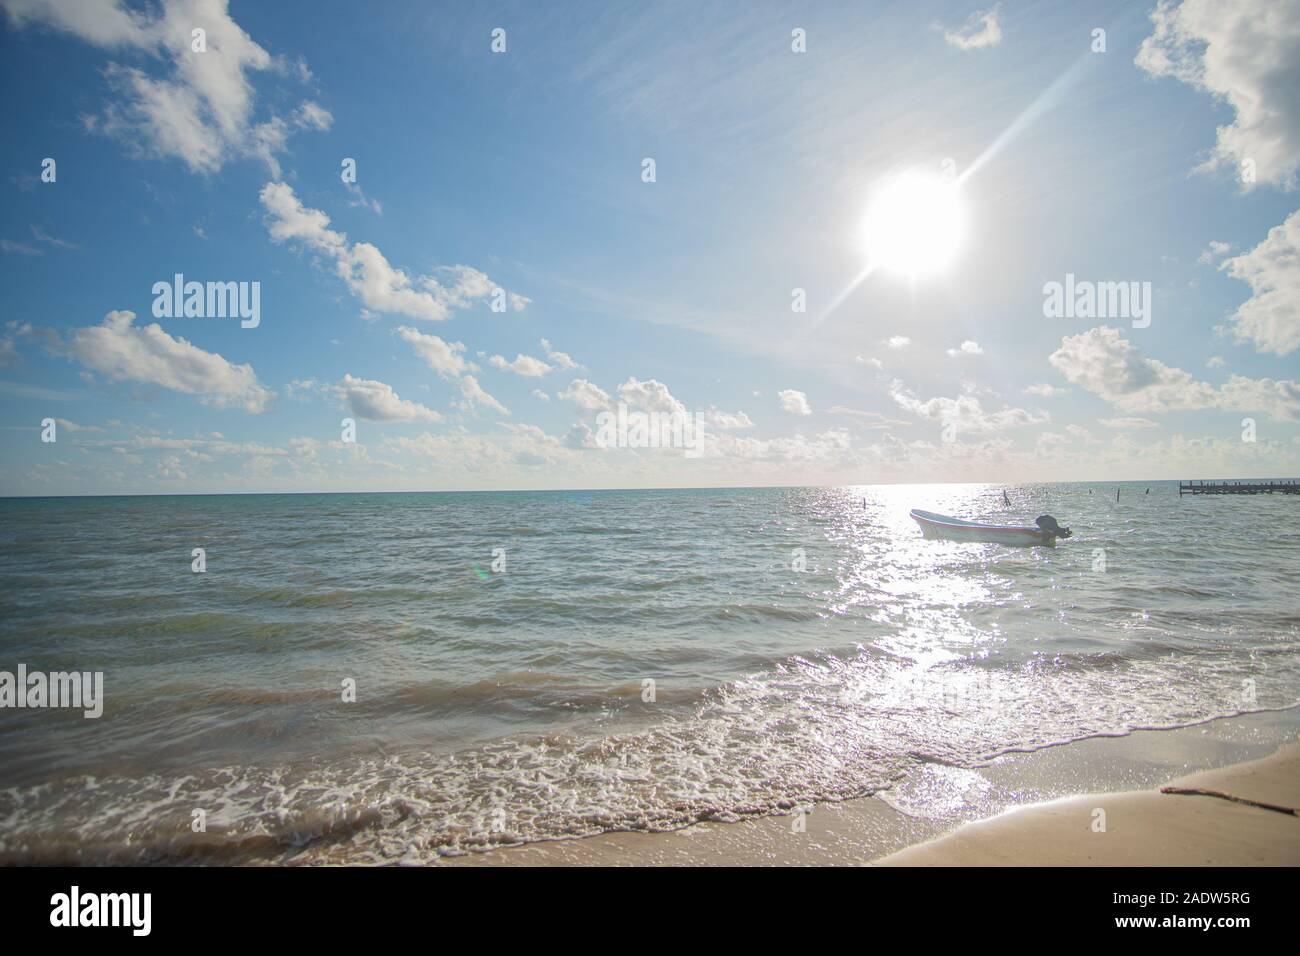 Heavenly Beach in Punta Allen at the caribbean Sea Stock Photo